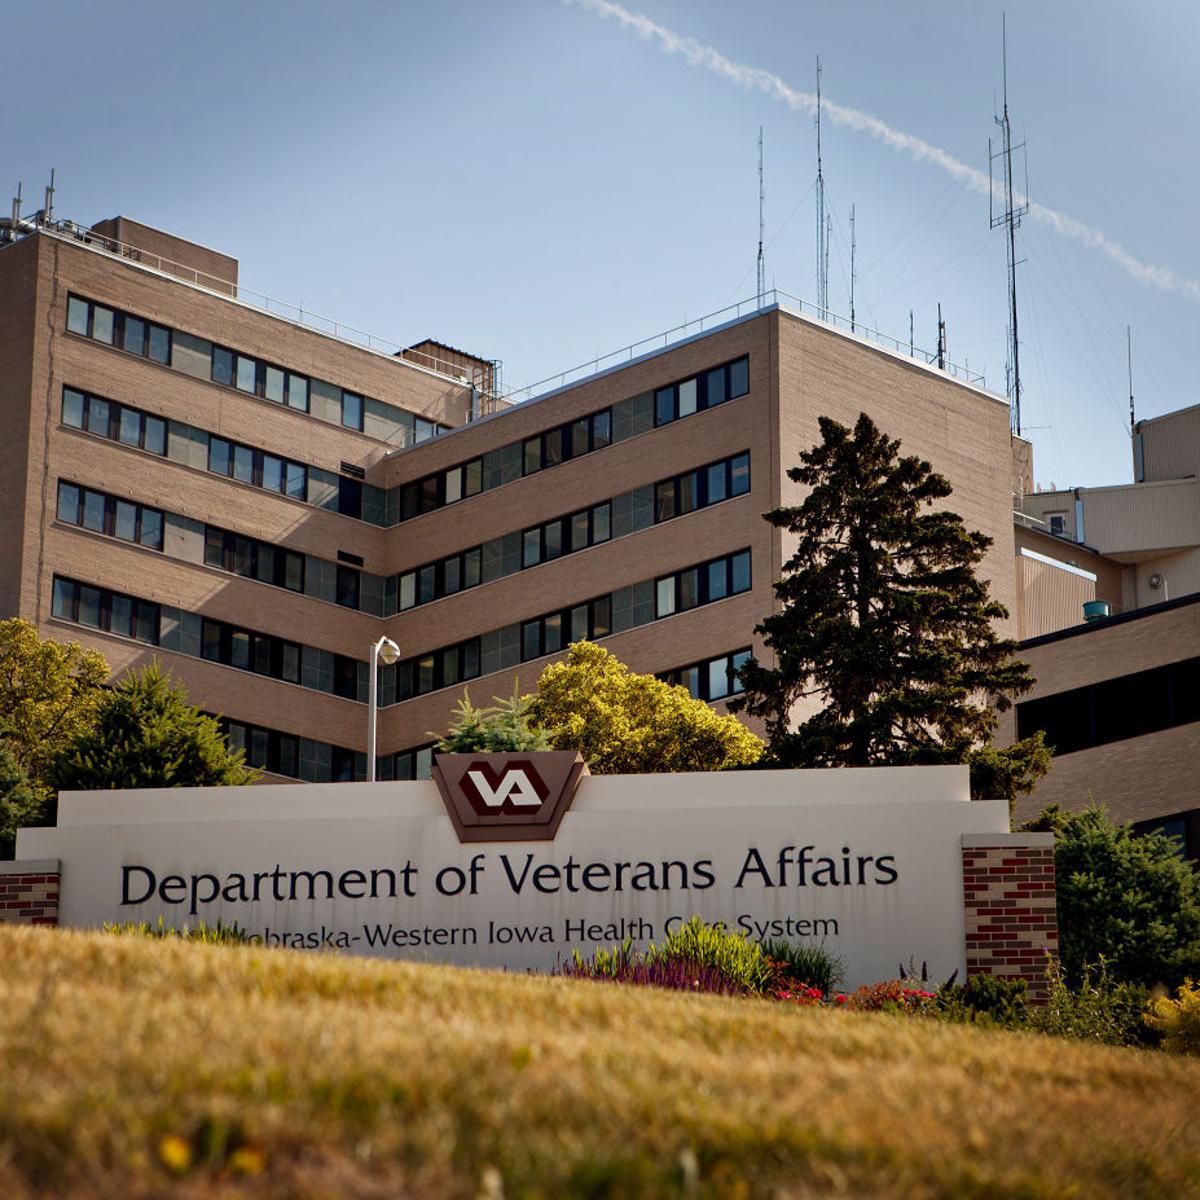 Denver VA hospital costs may may halt Omaha project, Lee Terry says